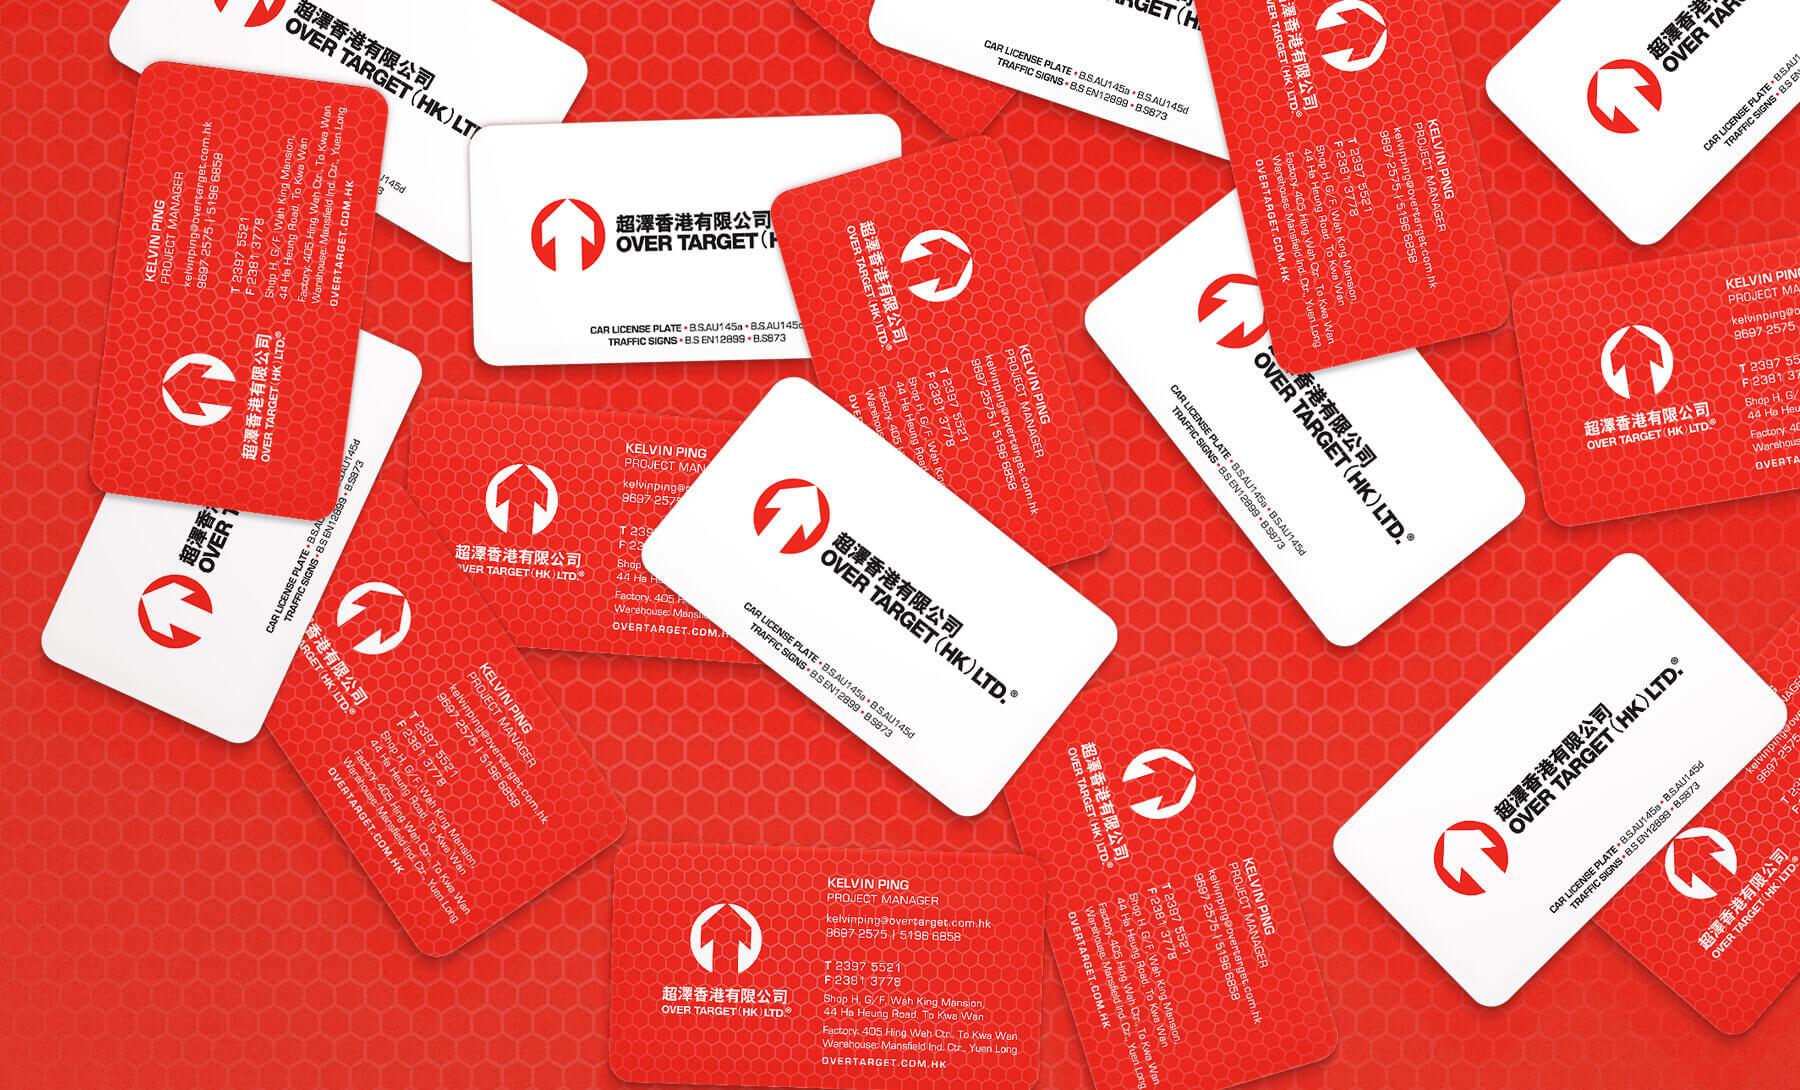 Over target business card michelle au design over target business card colourmoves